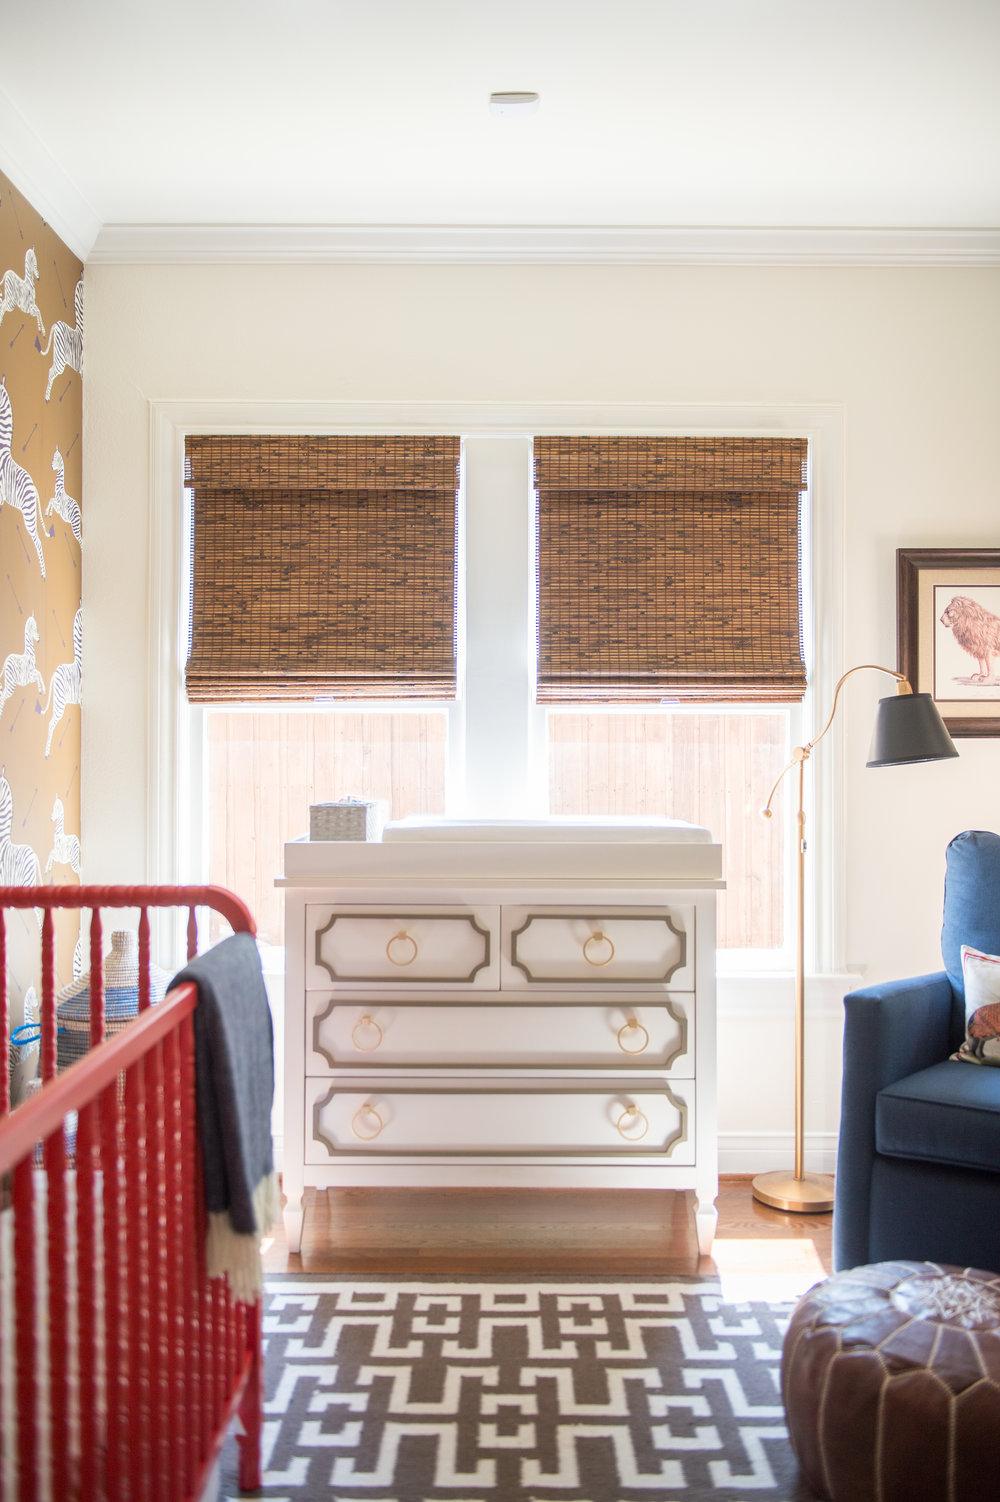 Camera Ready Interiors — MH Designs